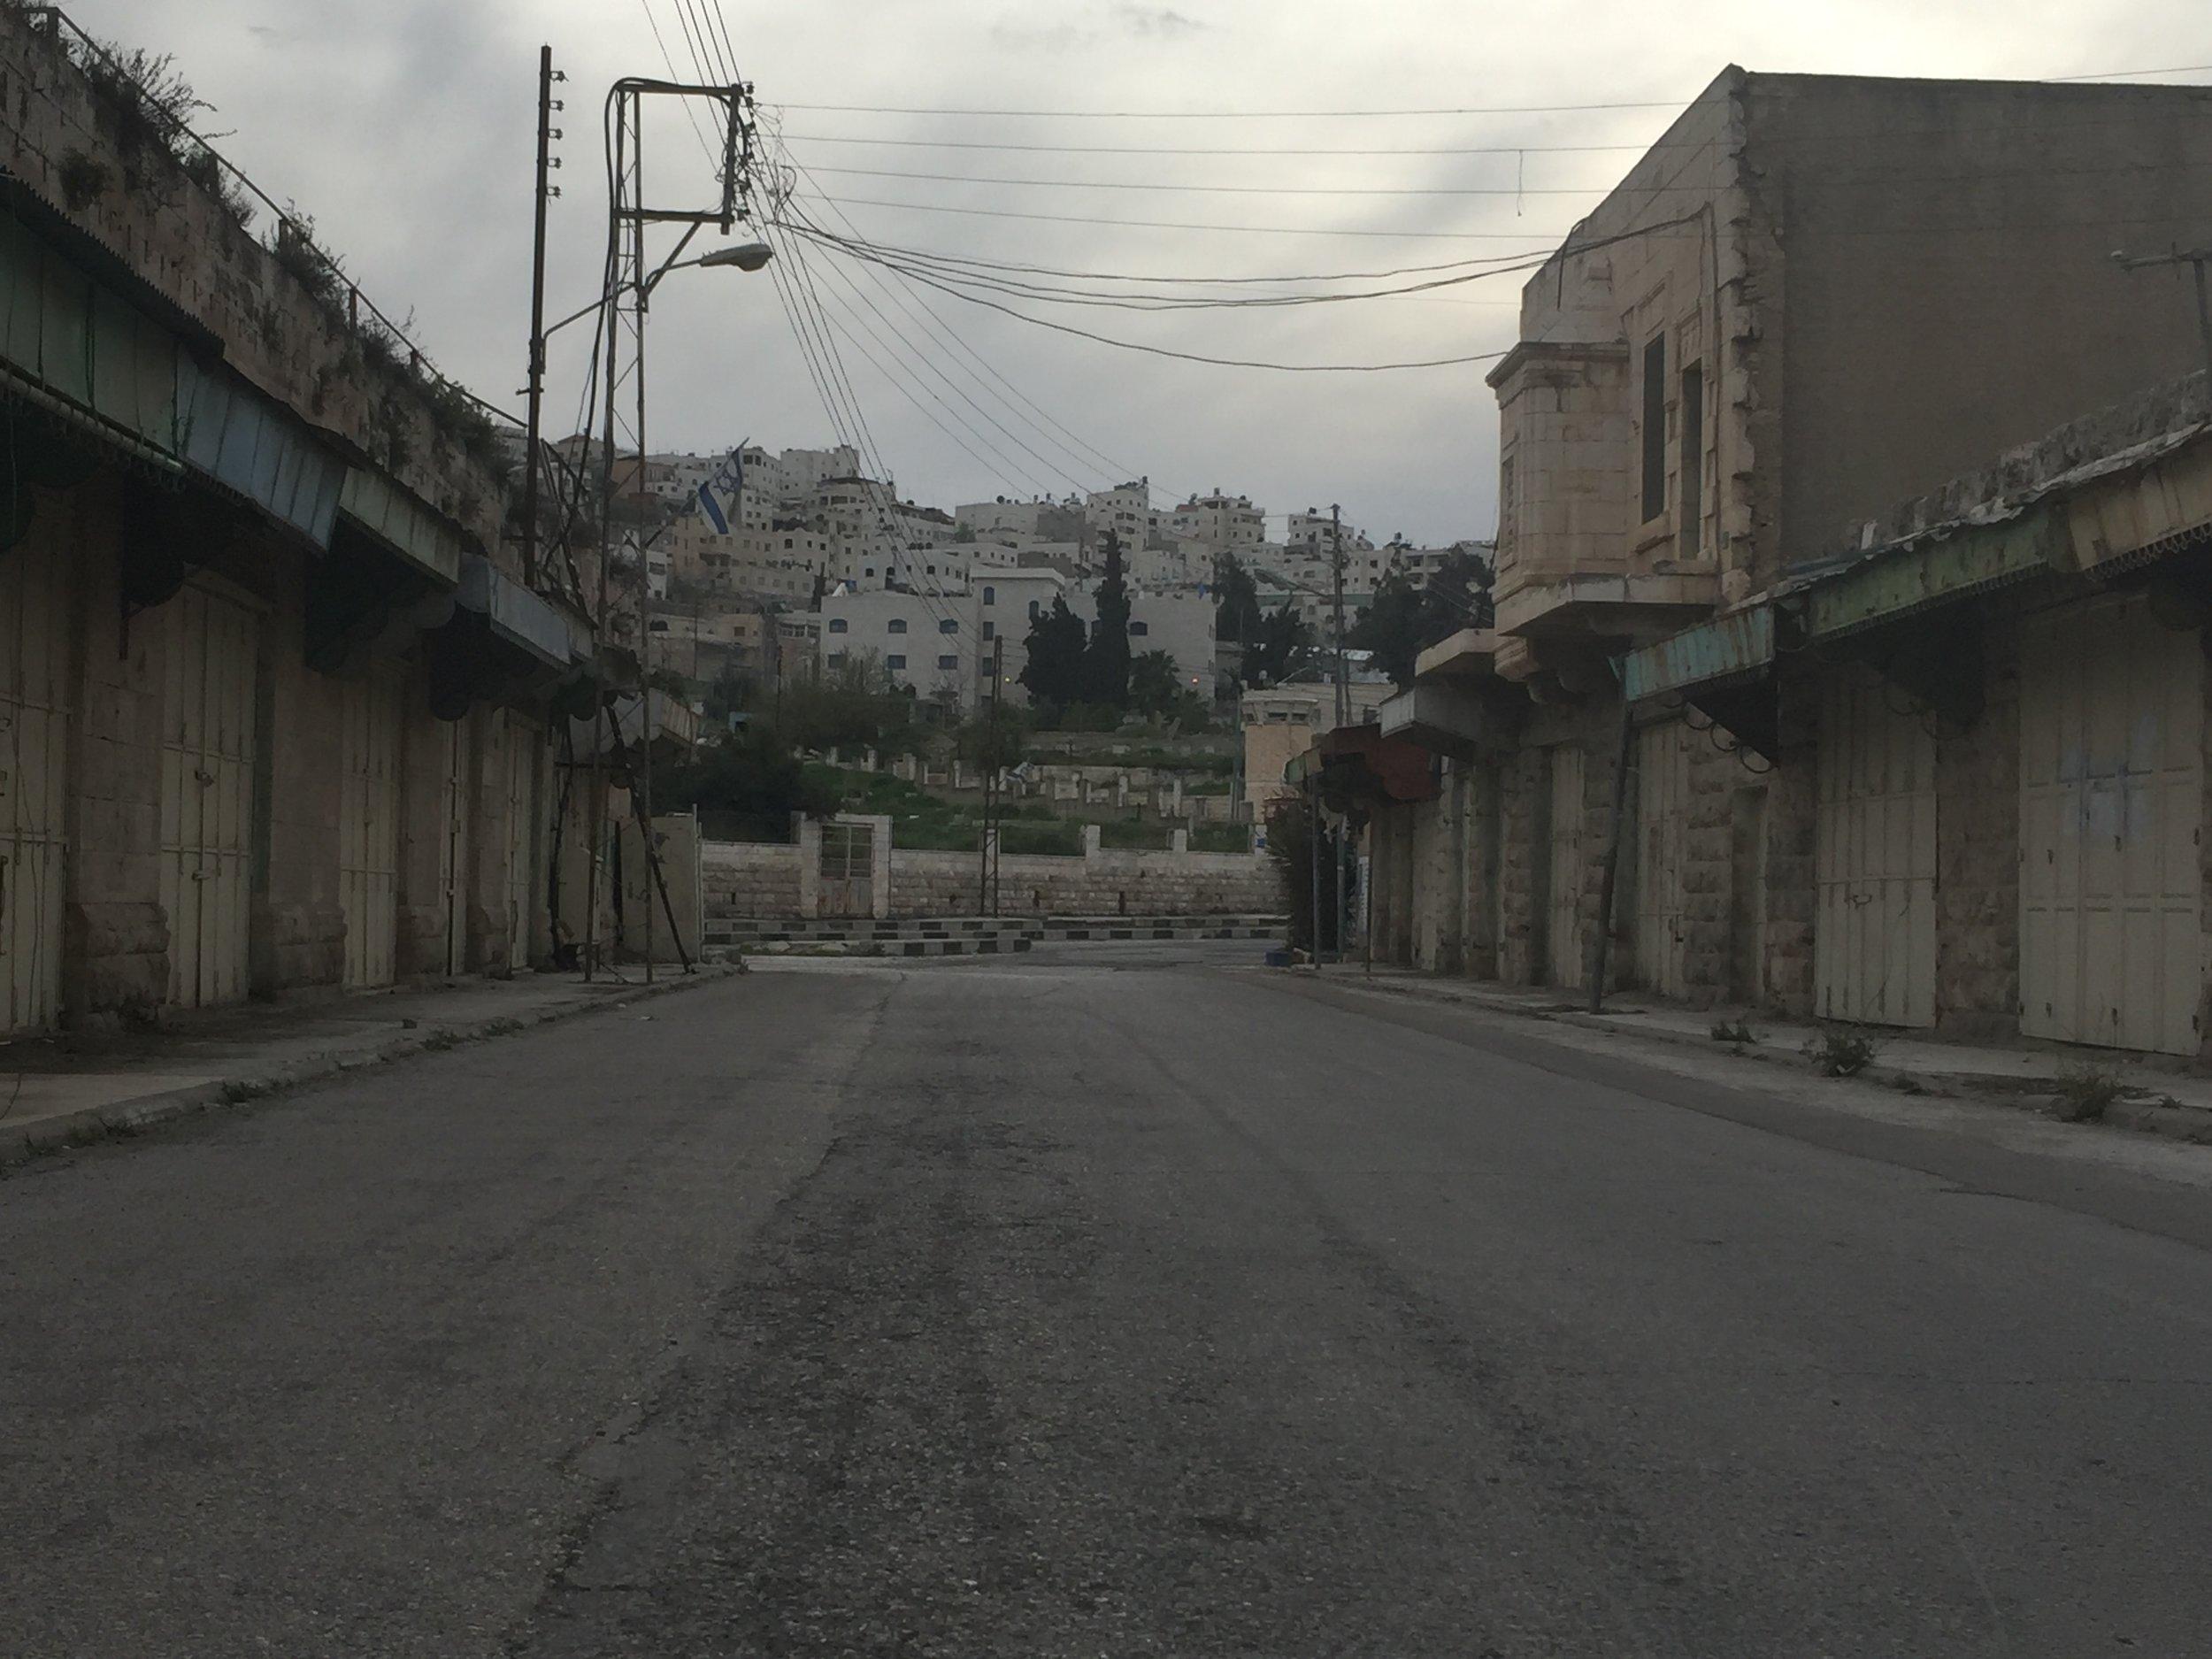 Matthew Williams/ The Conflict Archives: Al-Shuhada Stree, Hebron.